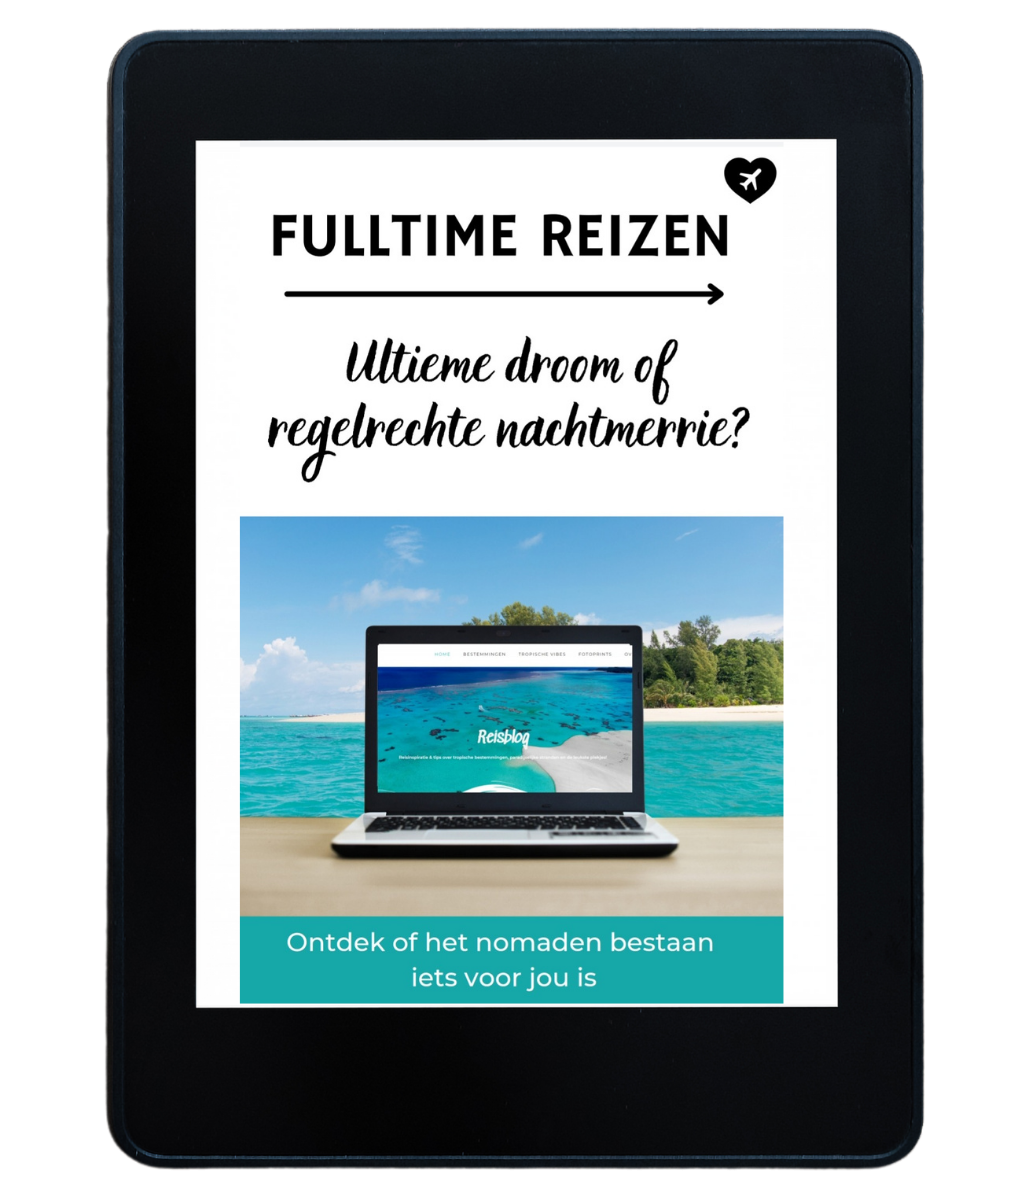 E-book fulltime reizen